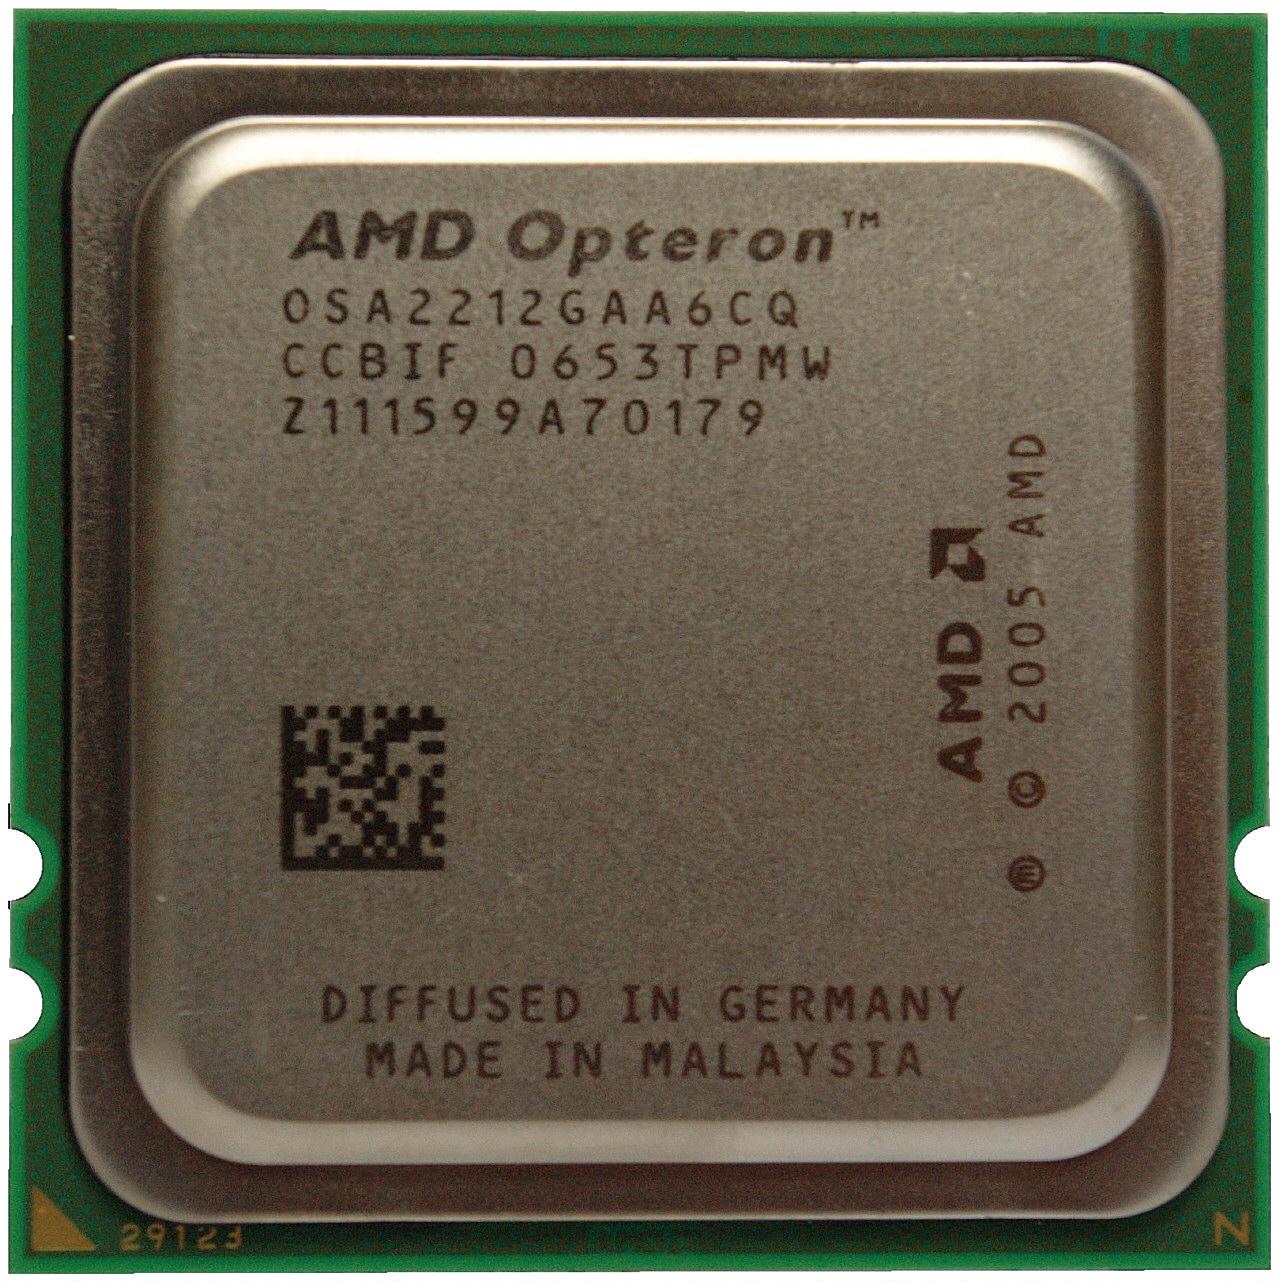 AMD ATHLON 64FXSEMPRONTURION 64OPTERON DRIVERS